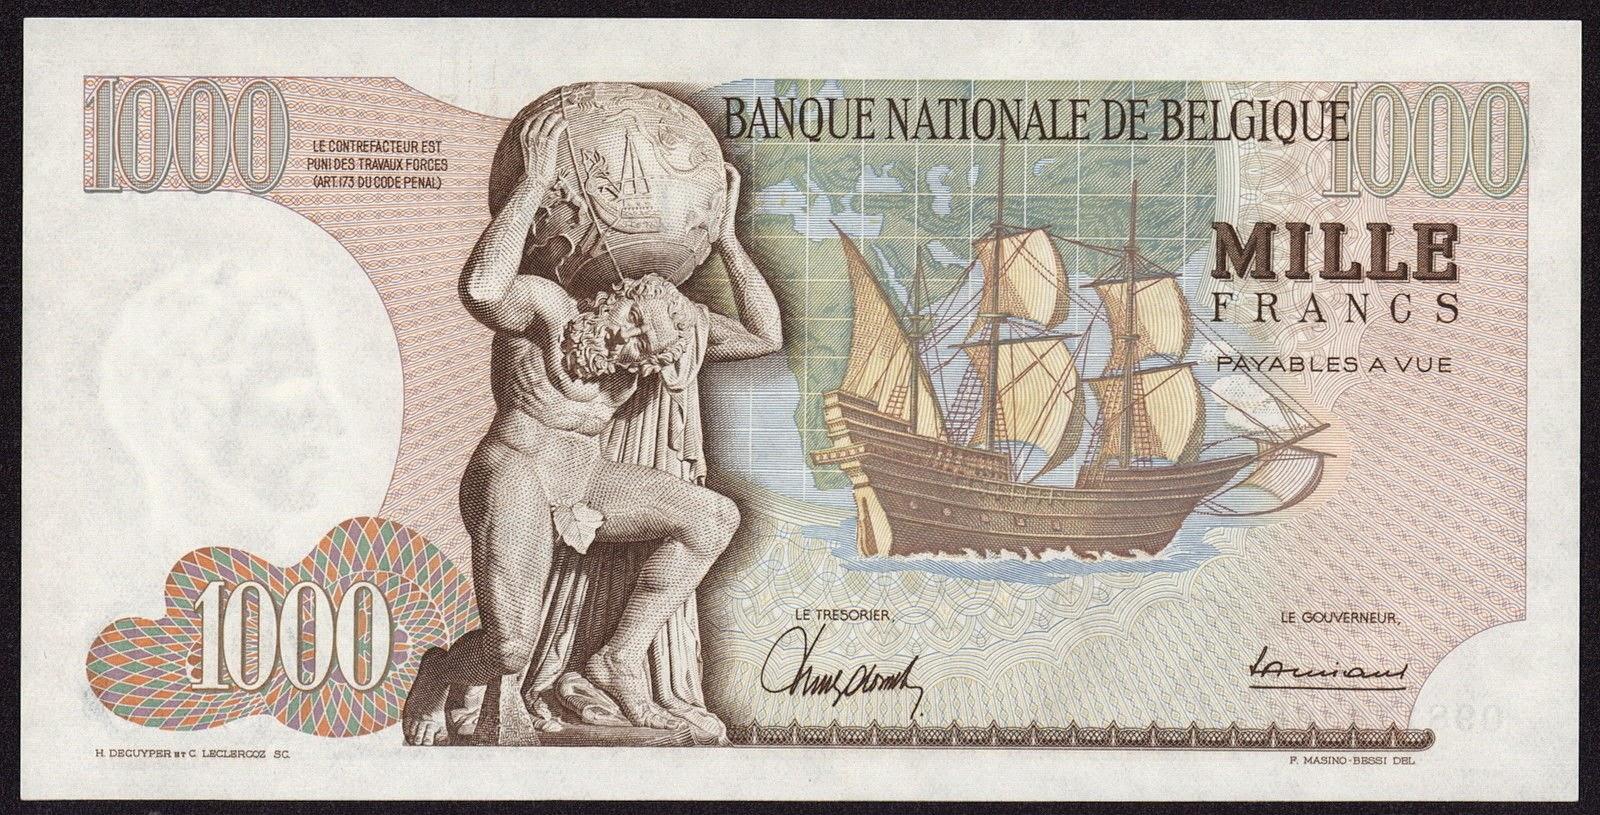 Belgium Banknotes 1000 Francs bank note 1964 Farnese Atlas holding globe